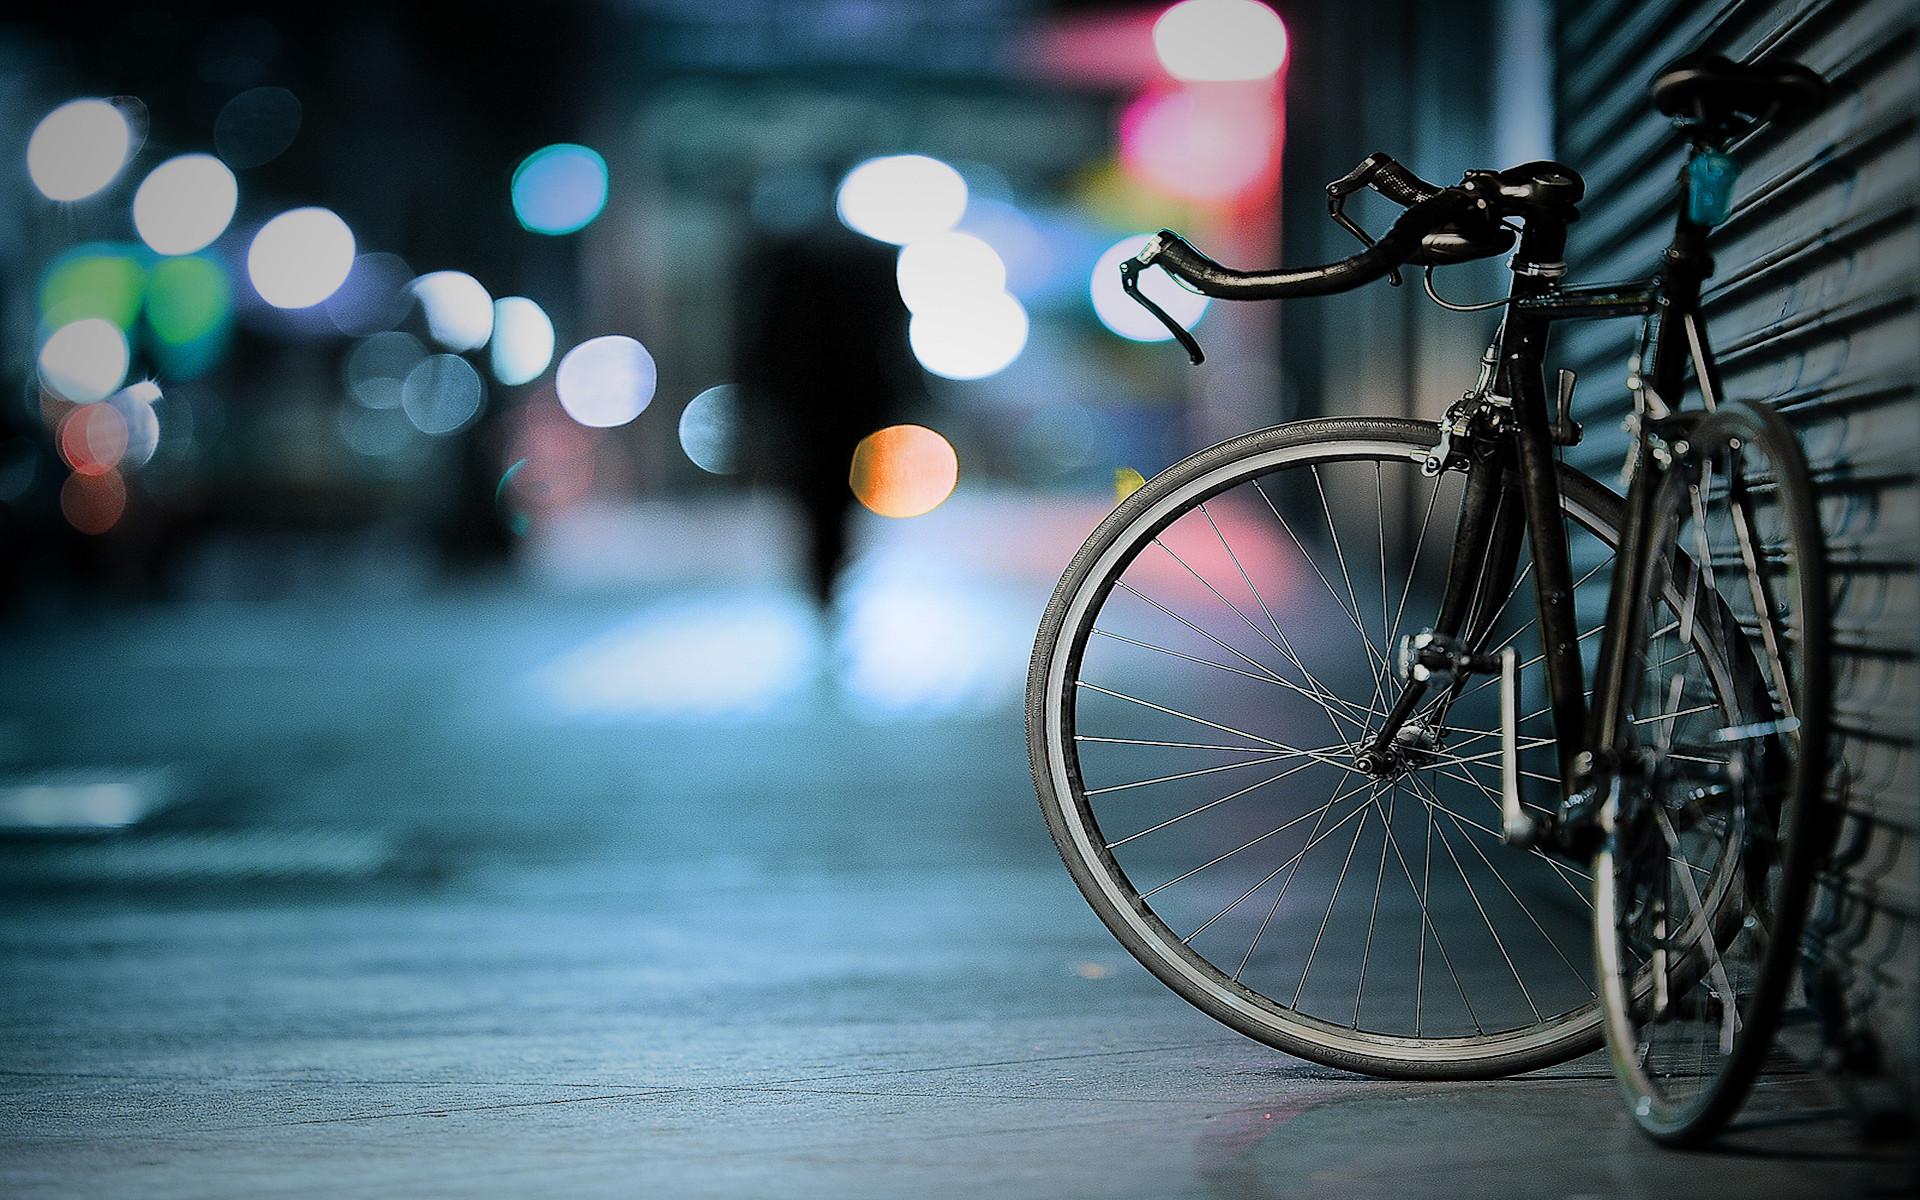 Description: Download Bicycle Photography wallpaper …